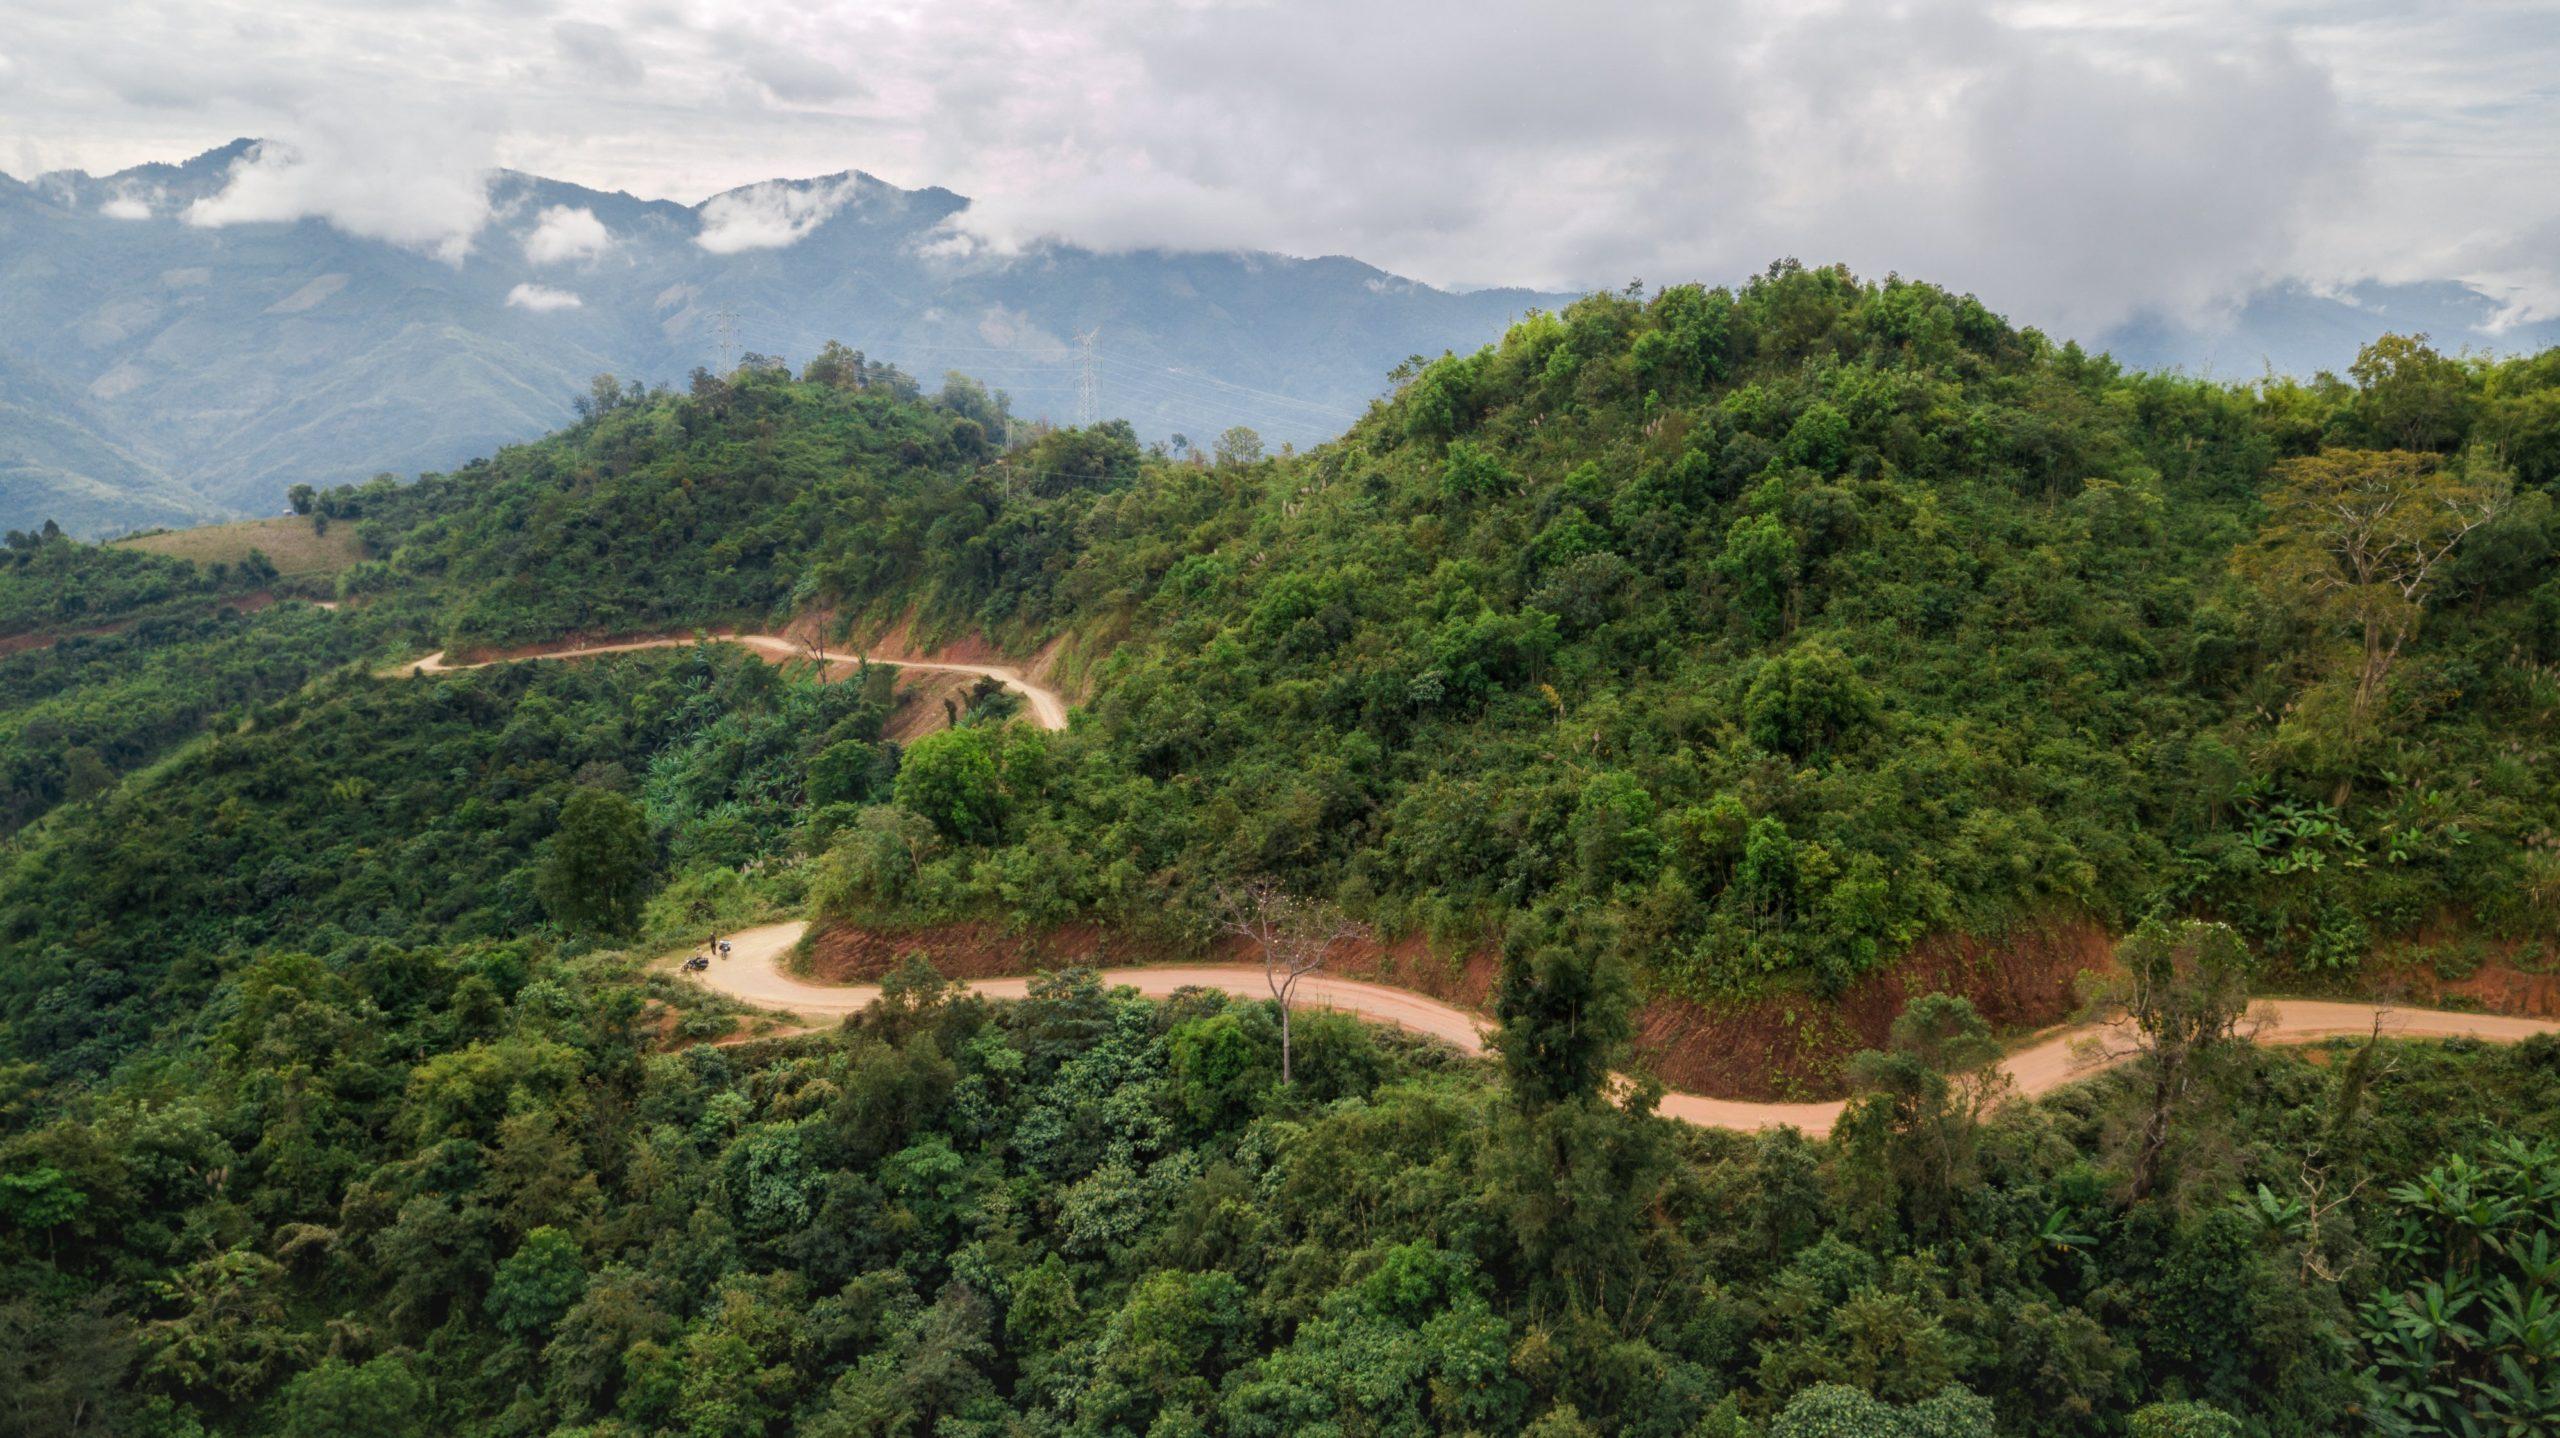 Motorrad-Roadtrip Thailand & Laos - Offroad in Thailand